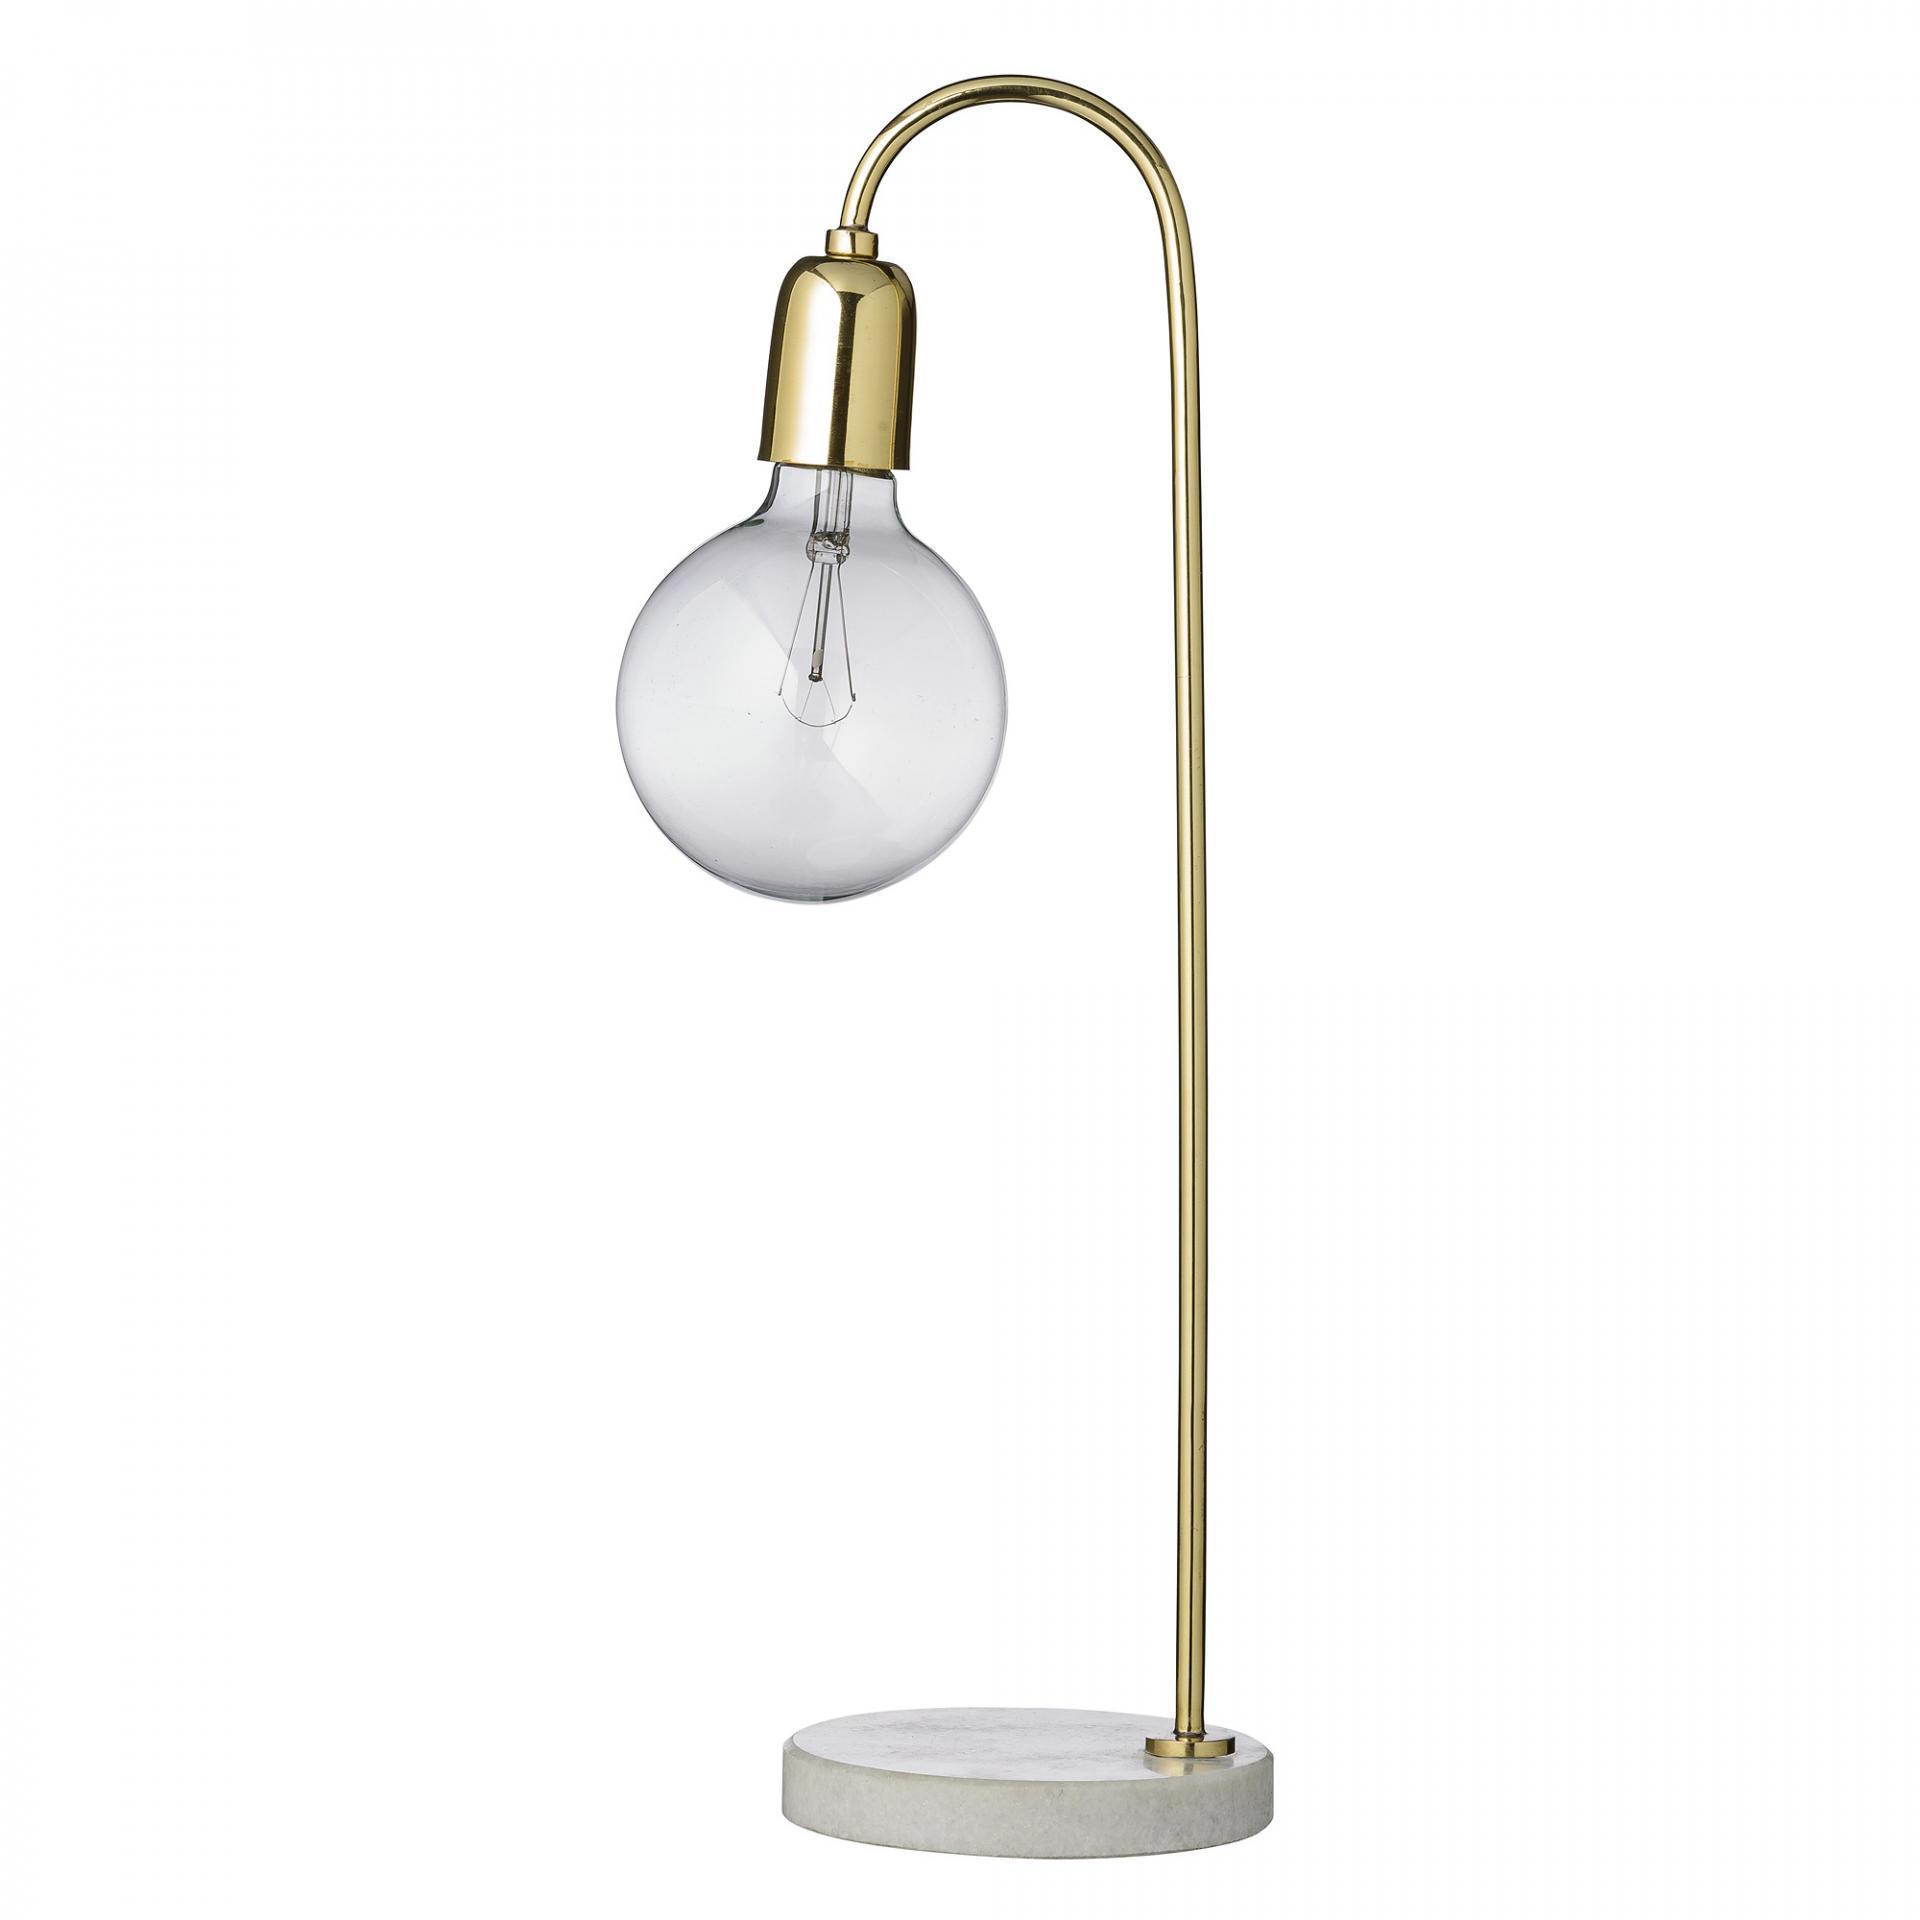 Bloomingville Stolní lampa Marble/brass, zlatá barva, kov, mramor